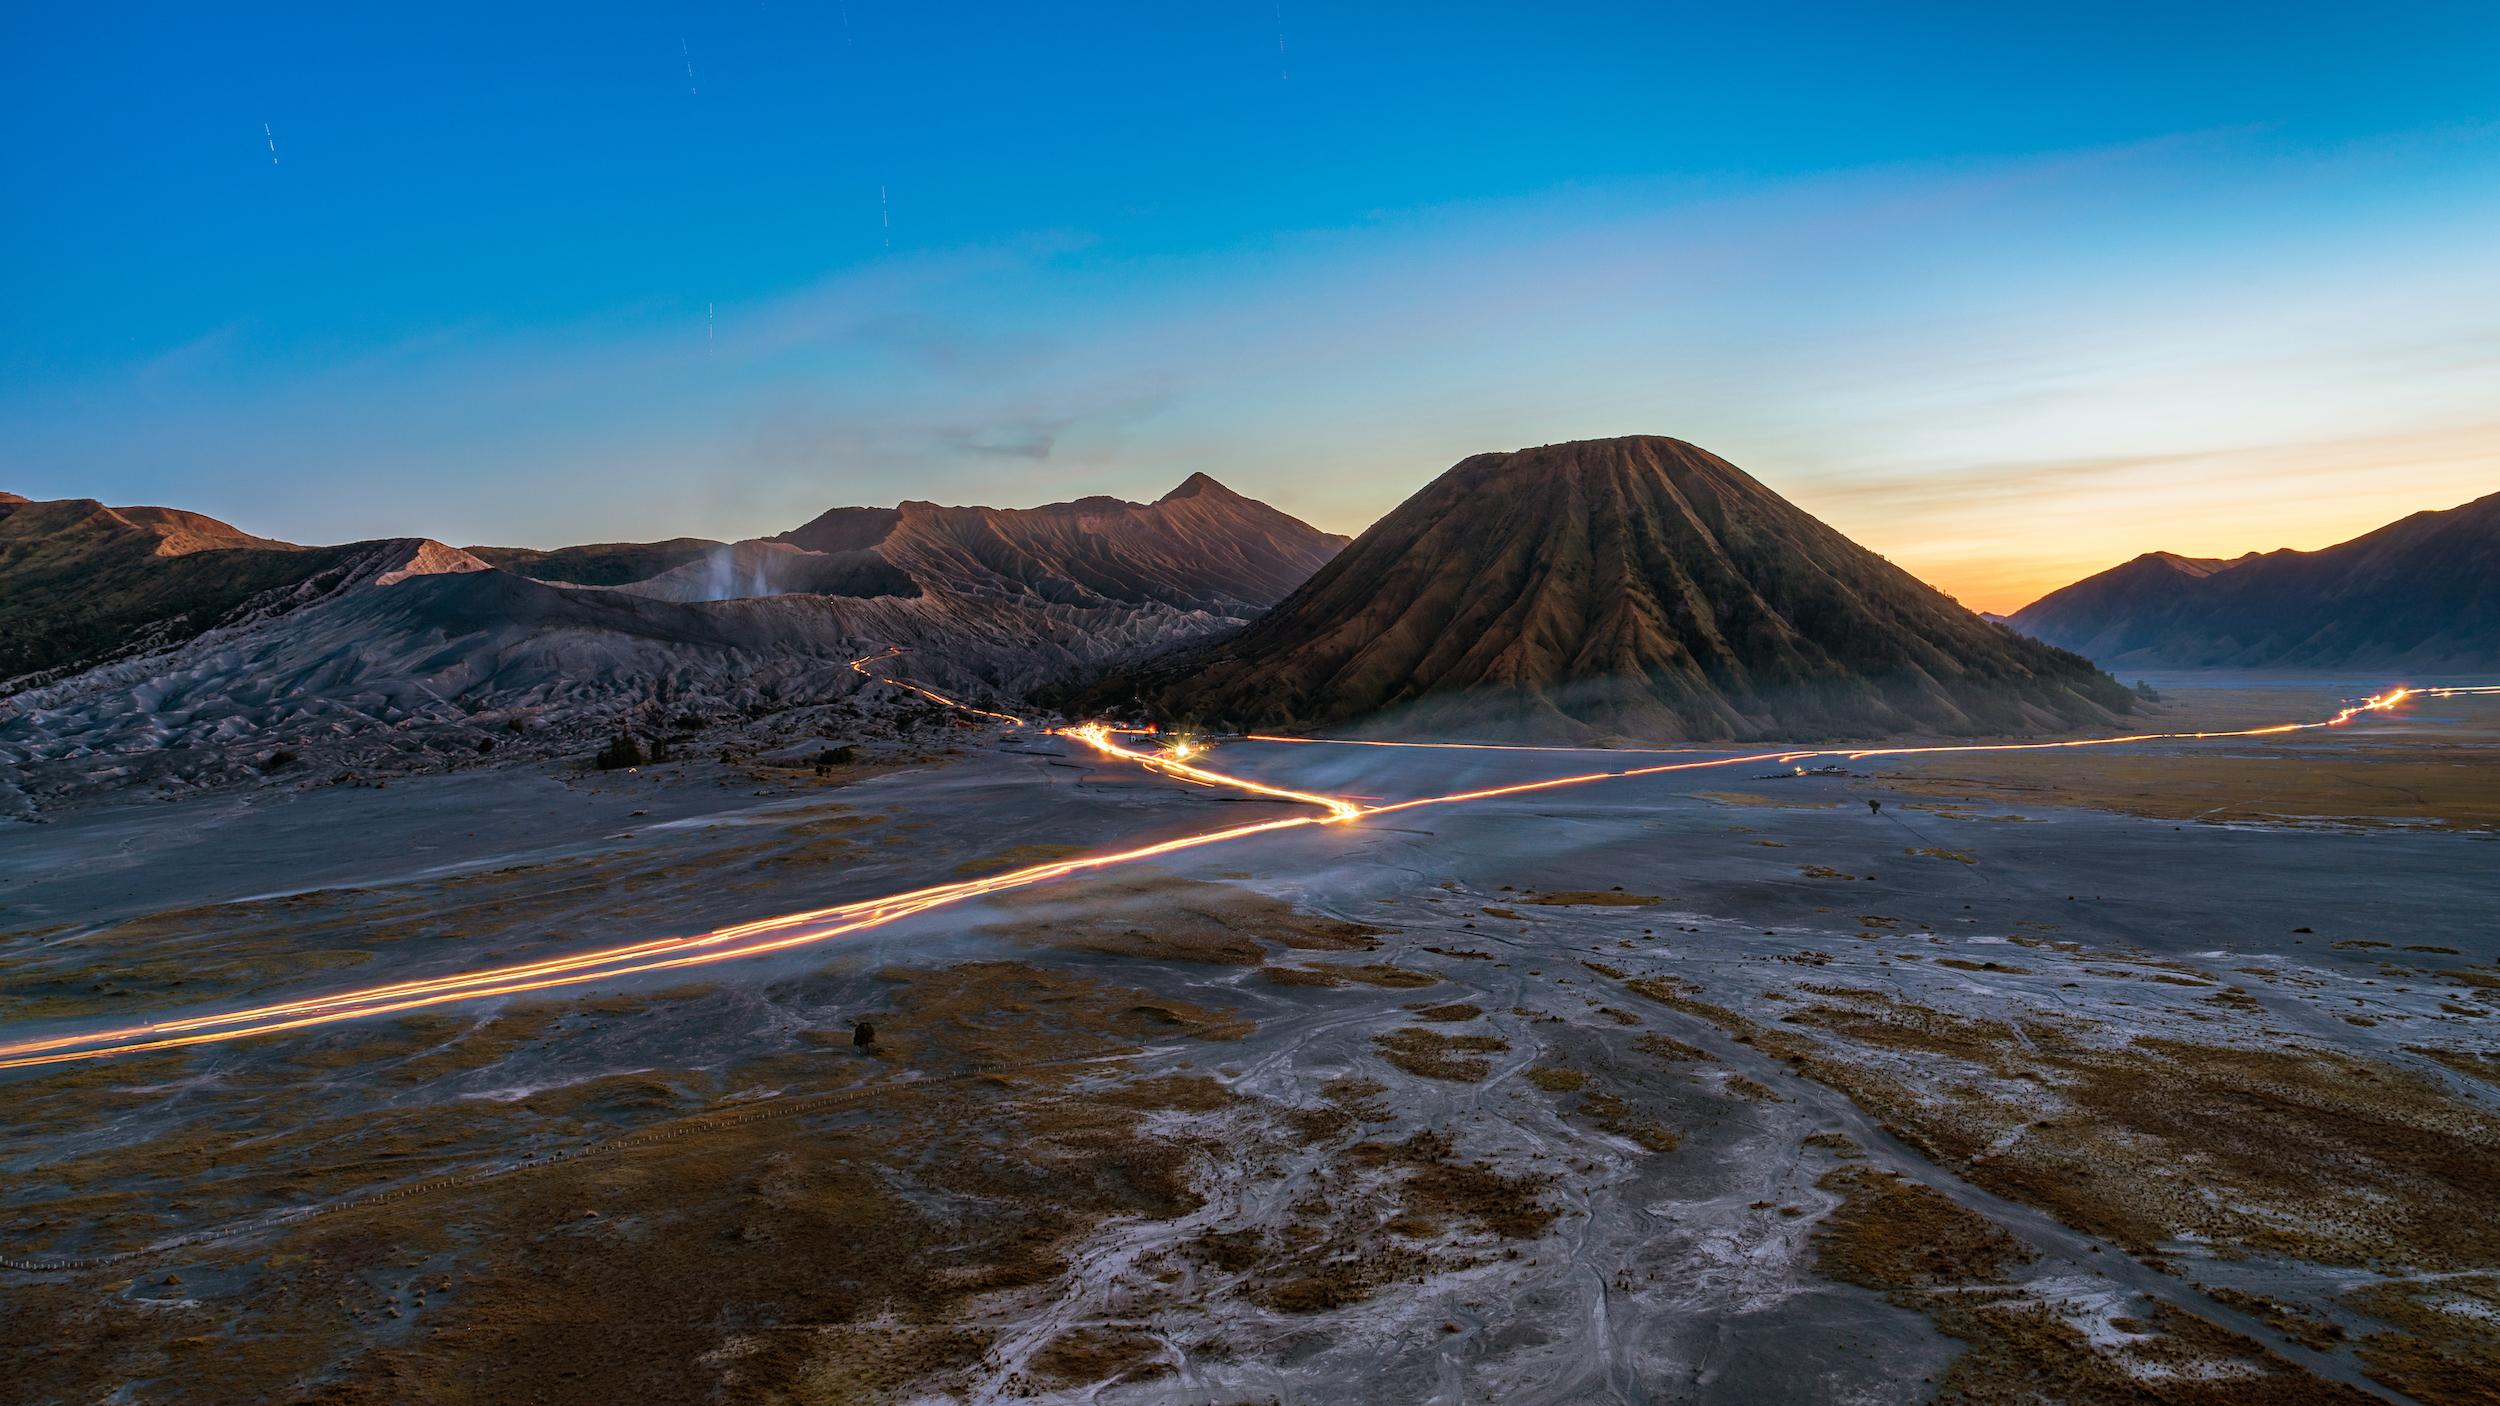 Dusk at Mount Bromo, Indonesia